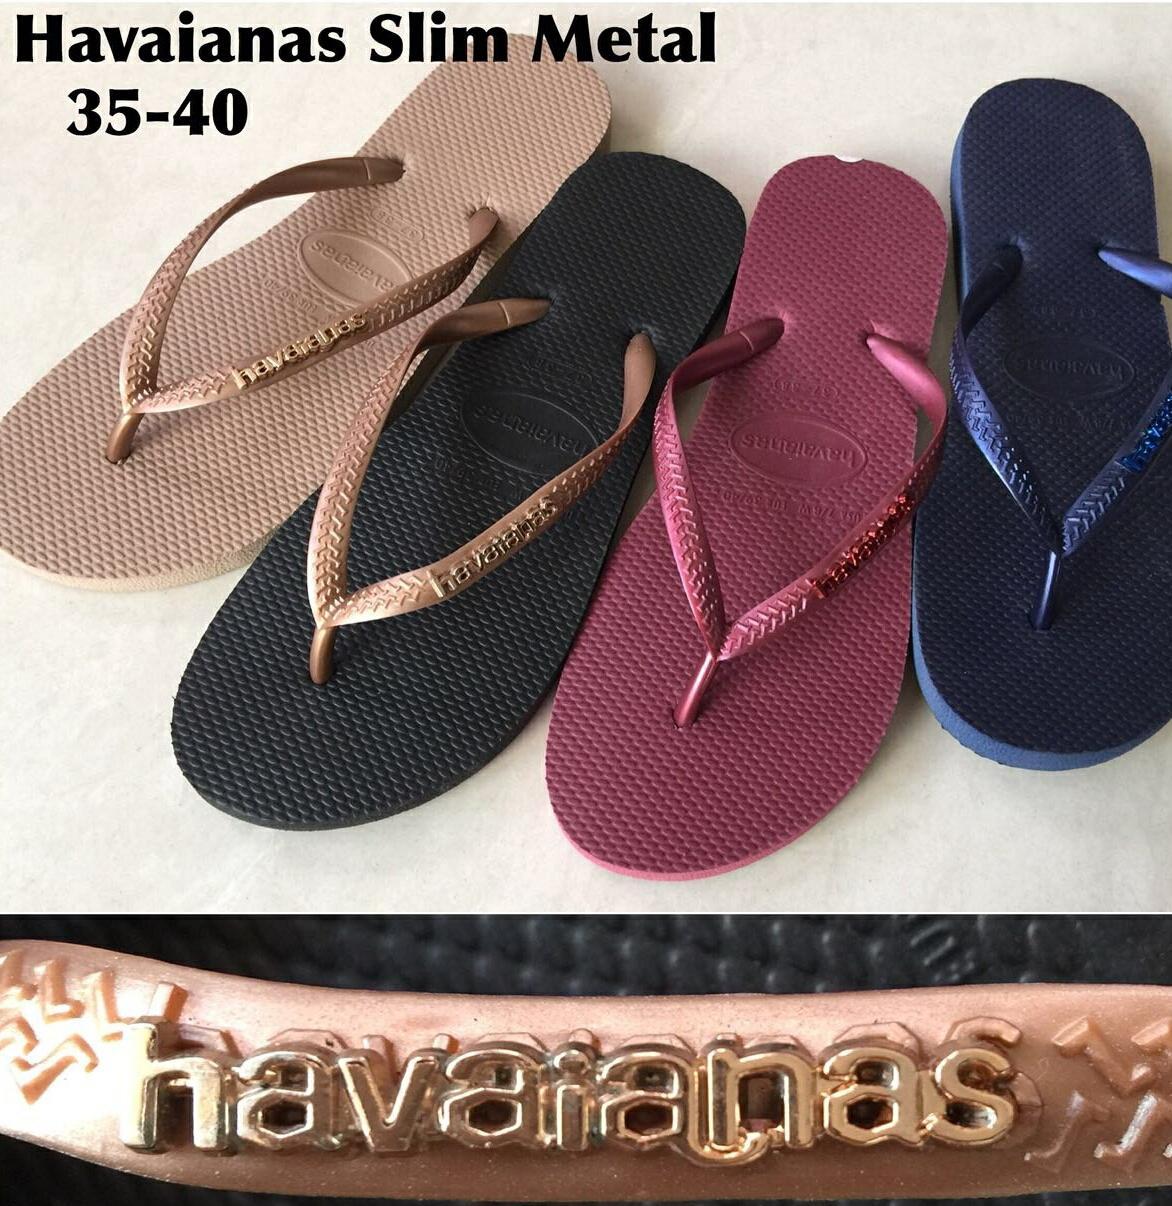 Sandal Wanita Havaianas Slim Metal (Warna Random)